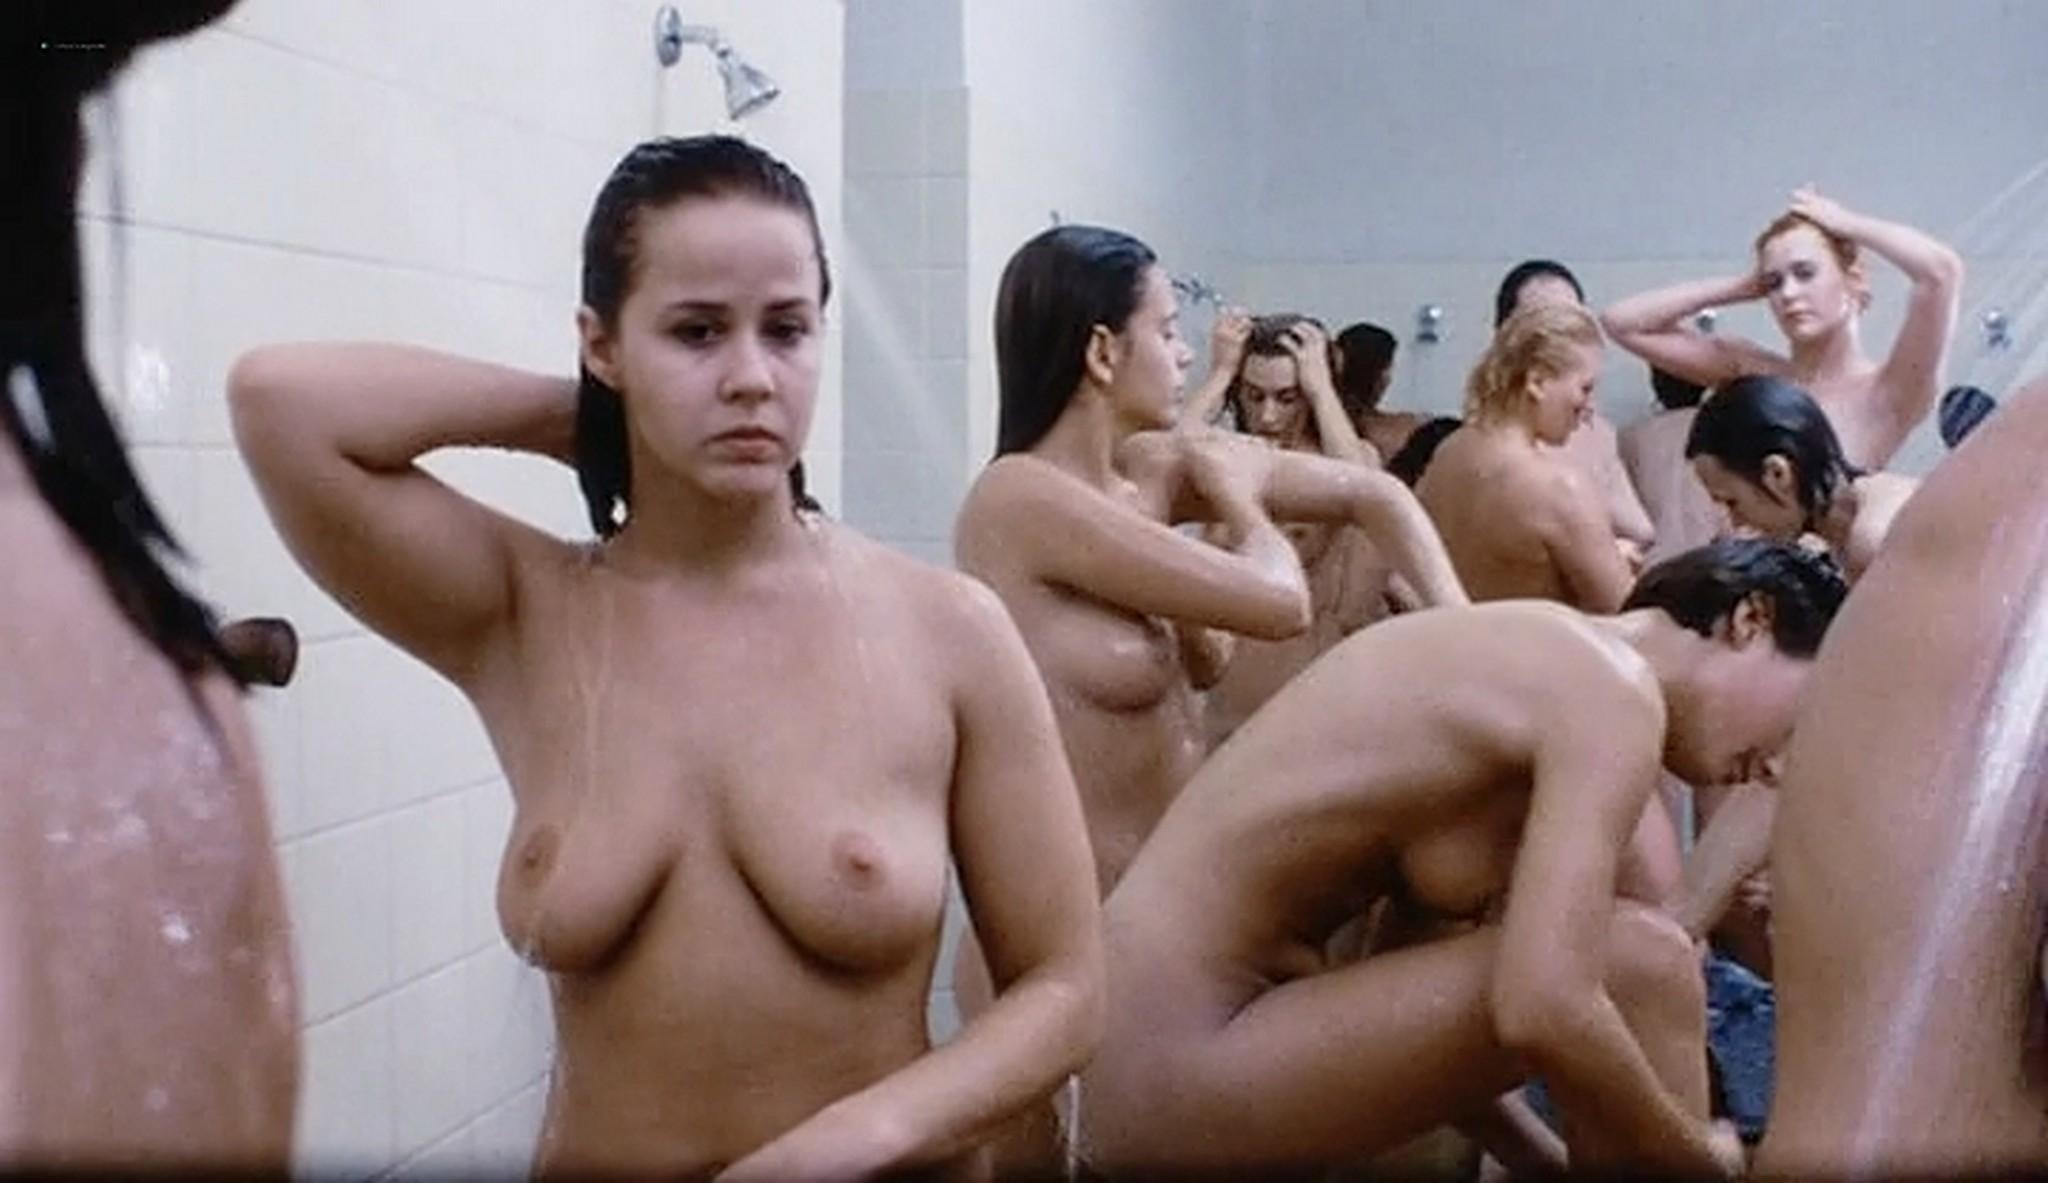 Linda Blair nude sex Sylvia Kristel and others nude too Red Heat 1985 VHSRip 7